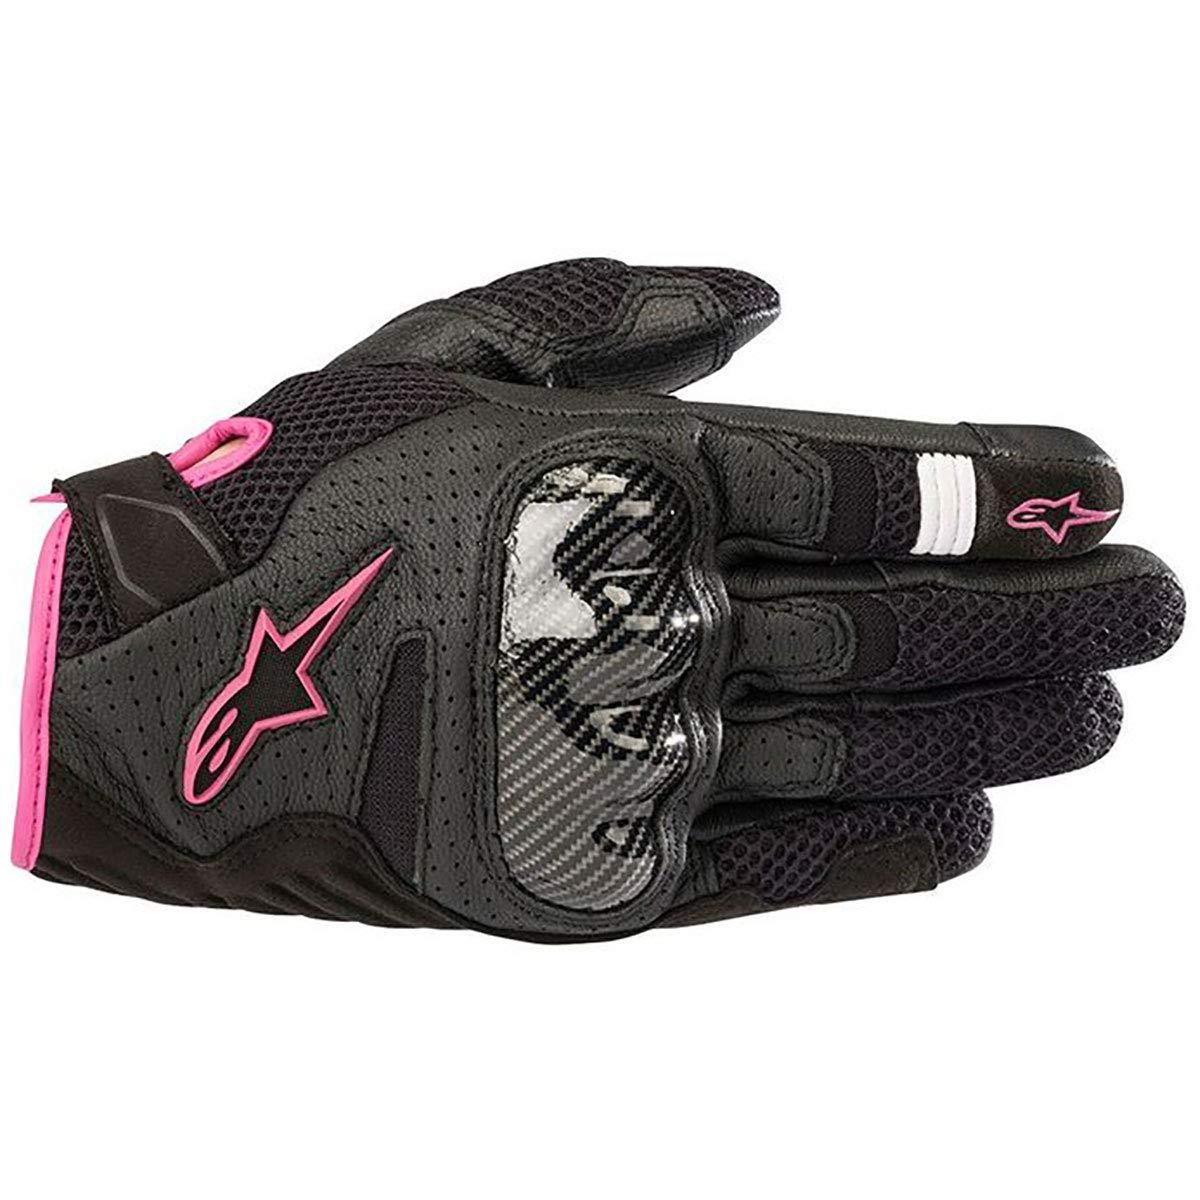 Alpinestars Women's Stella SMX-1 Air V2 Gloves (Large) (Black Fuchsia)